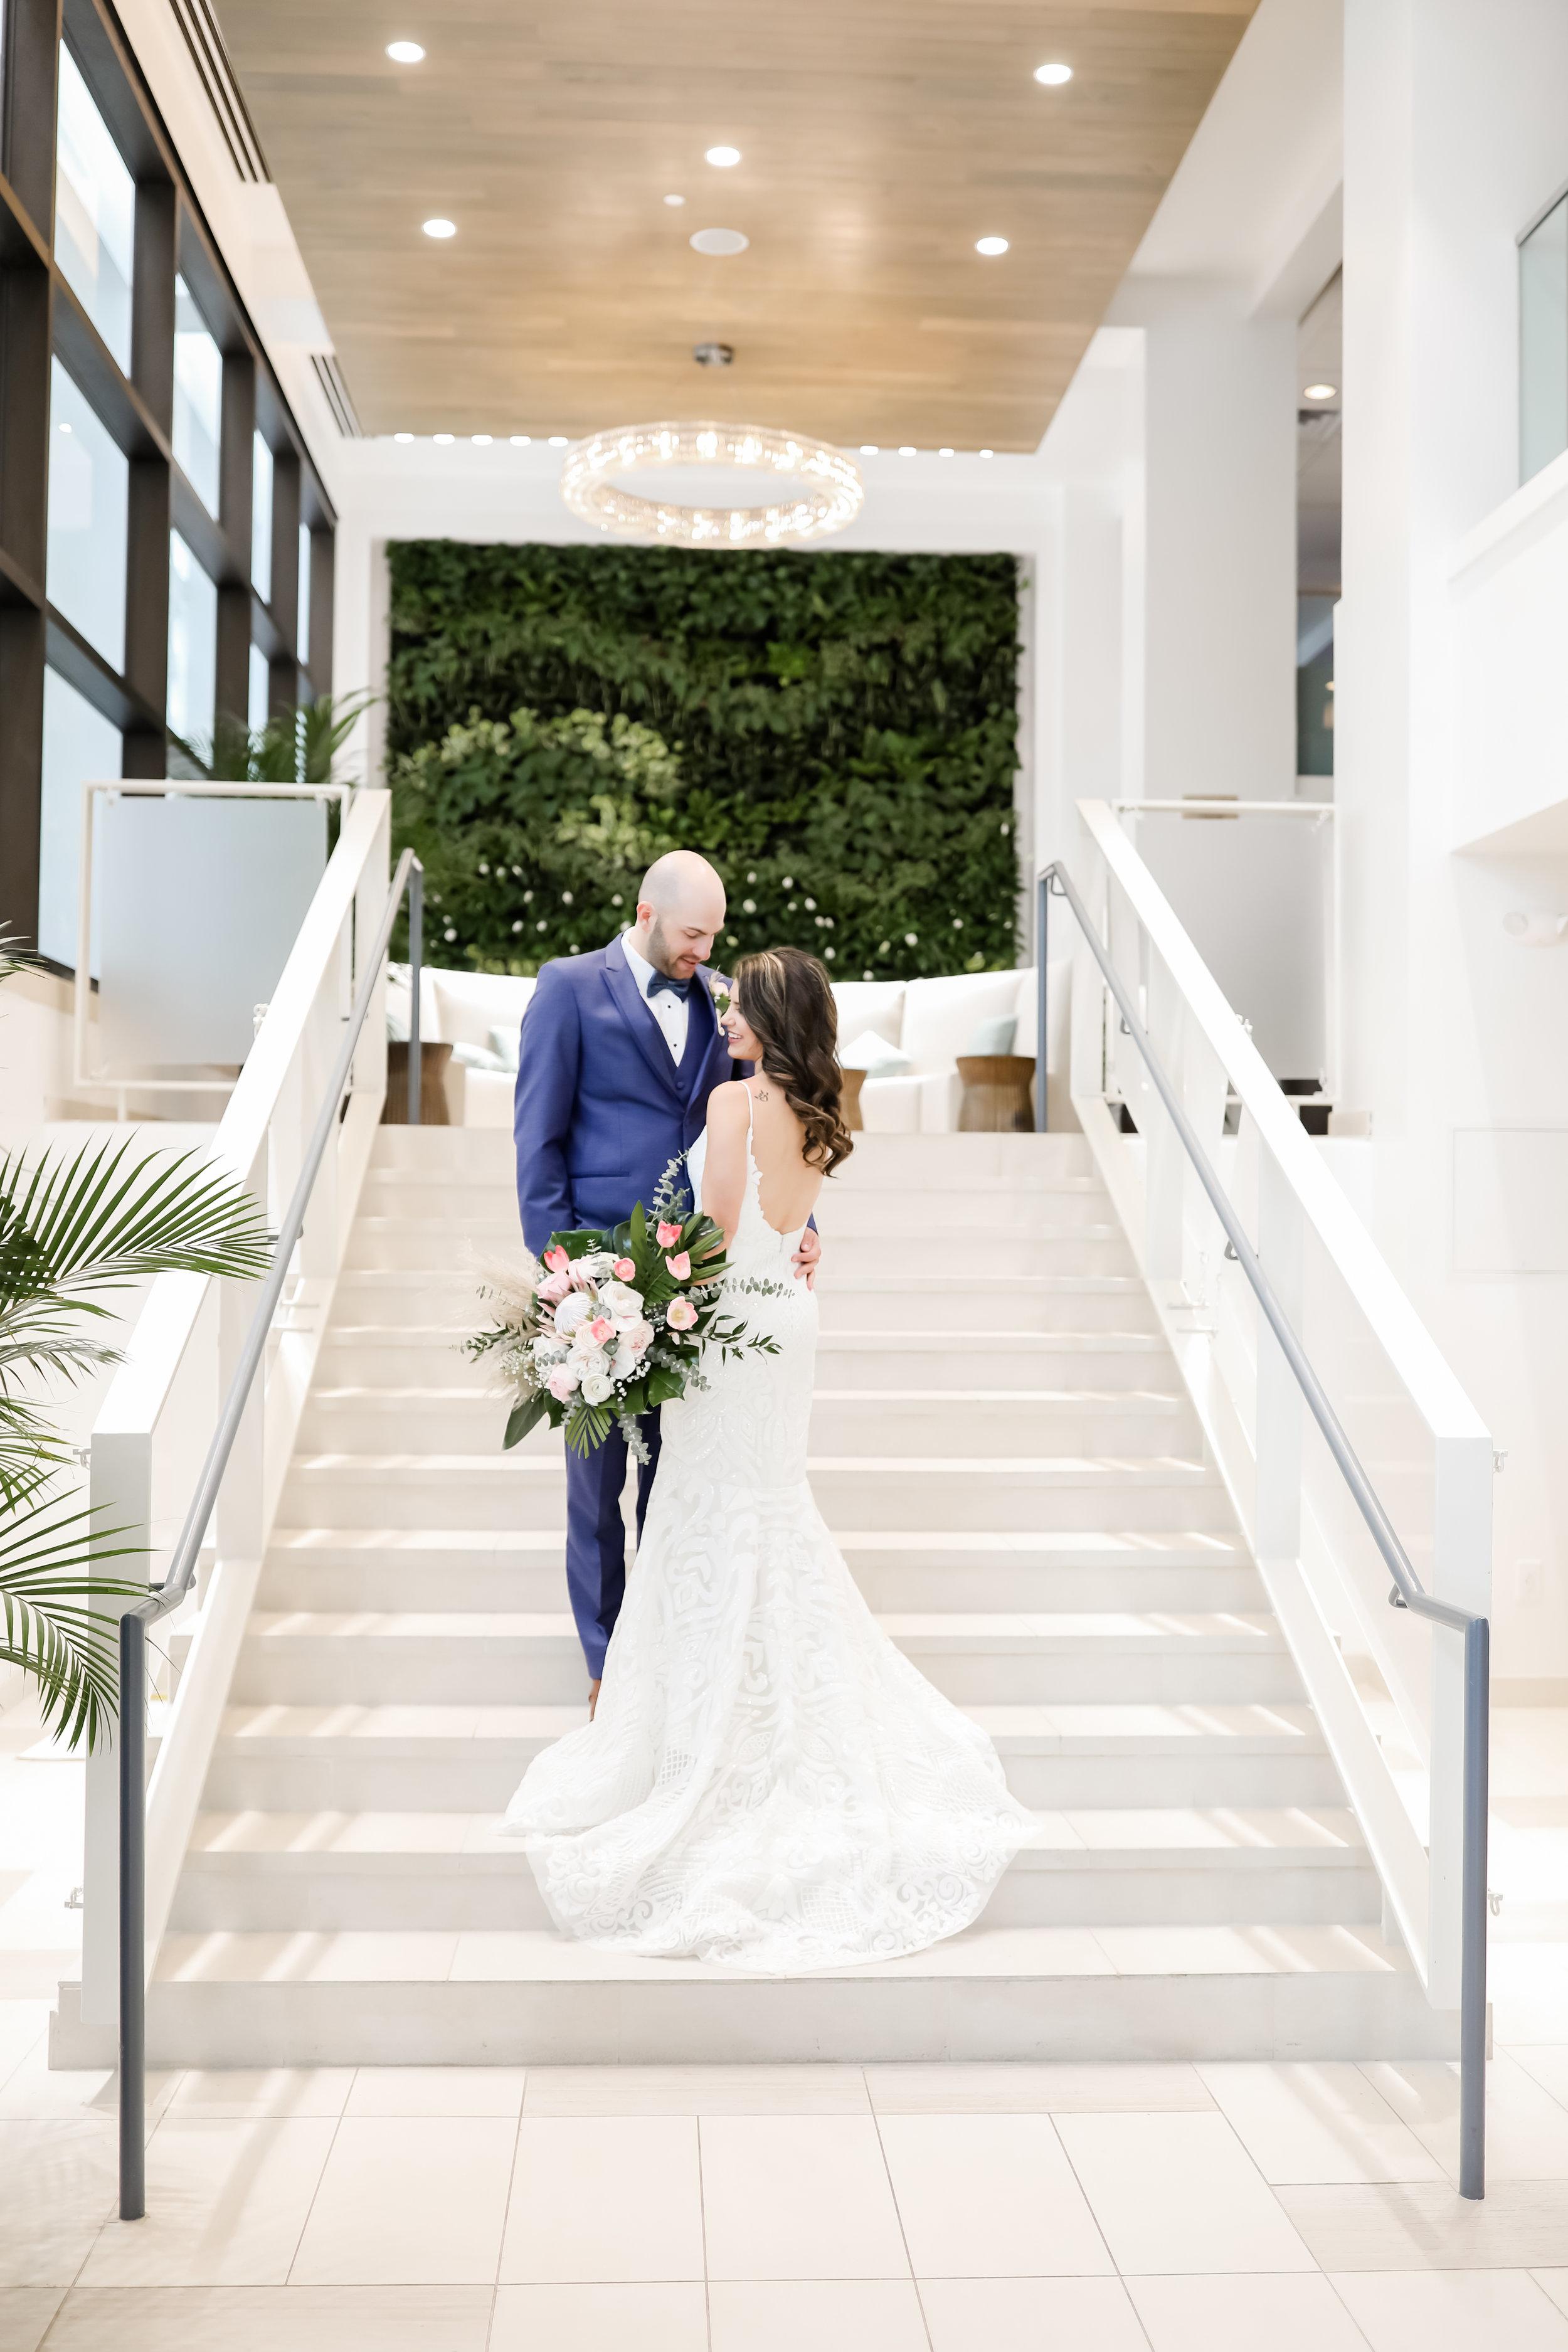 Weddings at Hilton Clearwater Beach Resort & Spa -